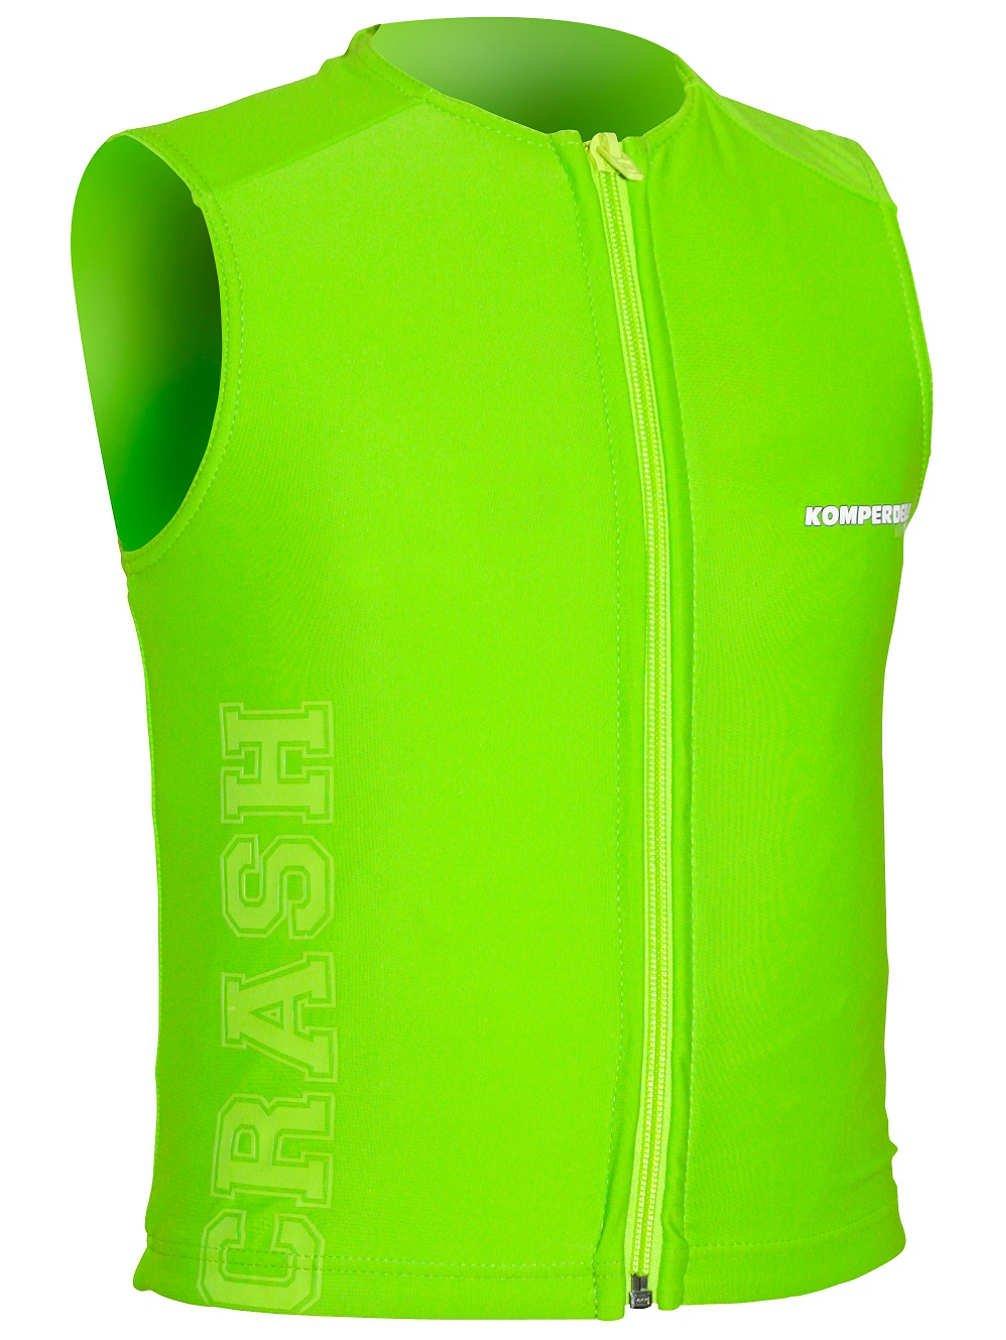 Komperdell Junior Eco Vest Green Protection, Juventud Unisex